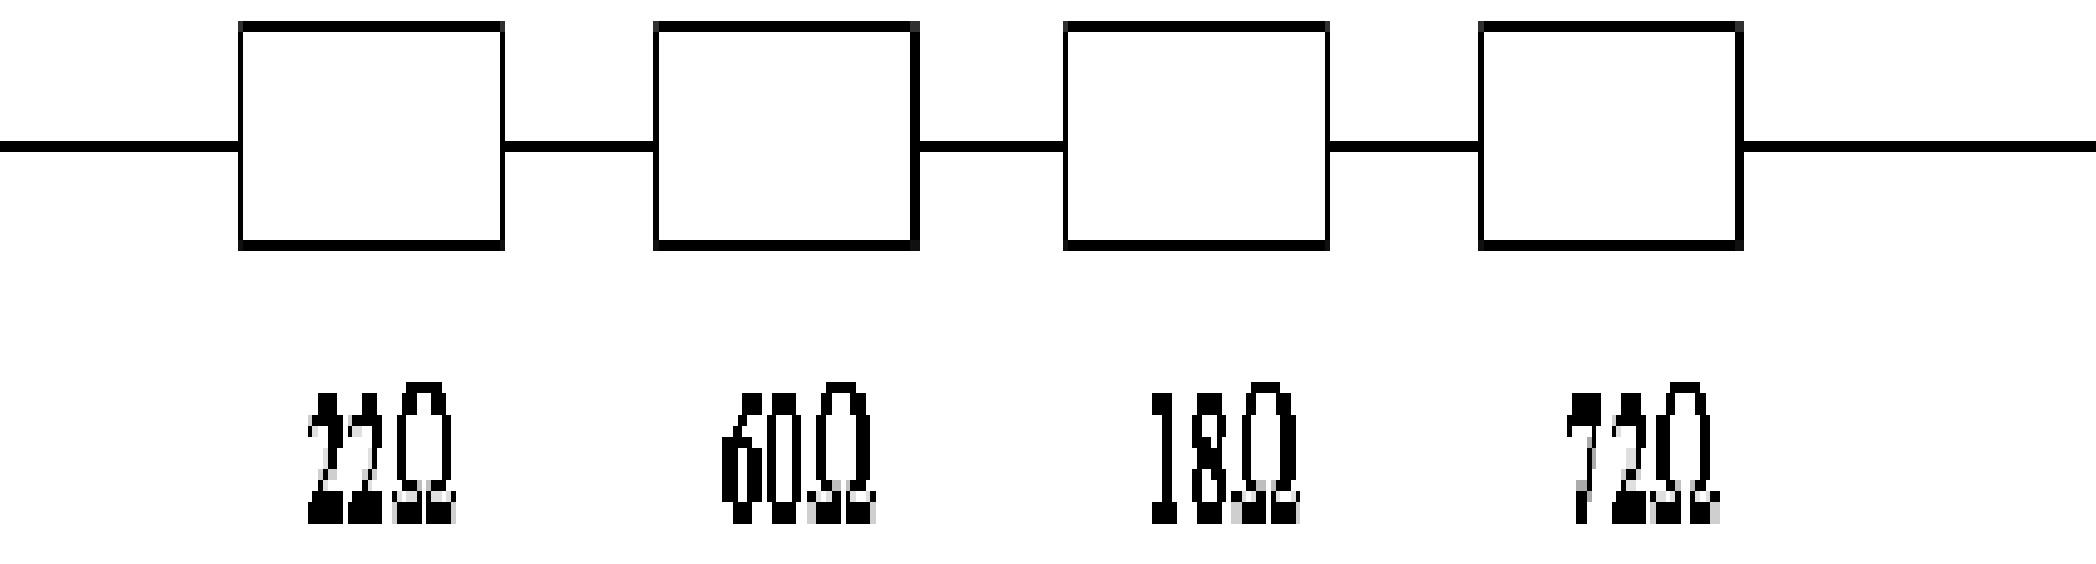 direnc-2-devreler